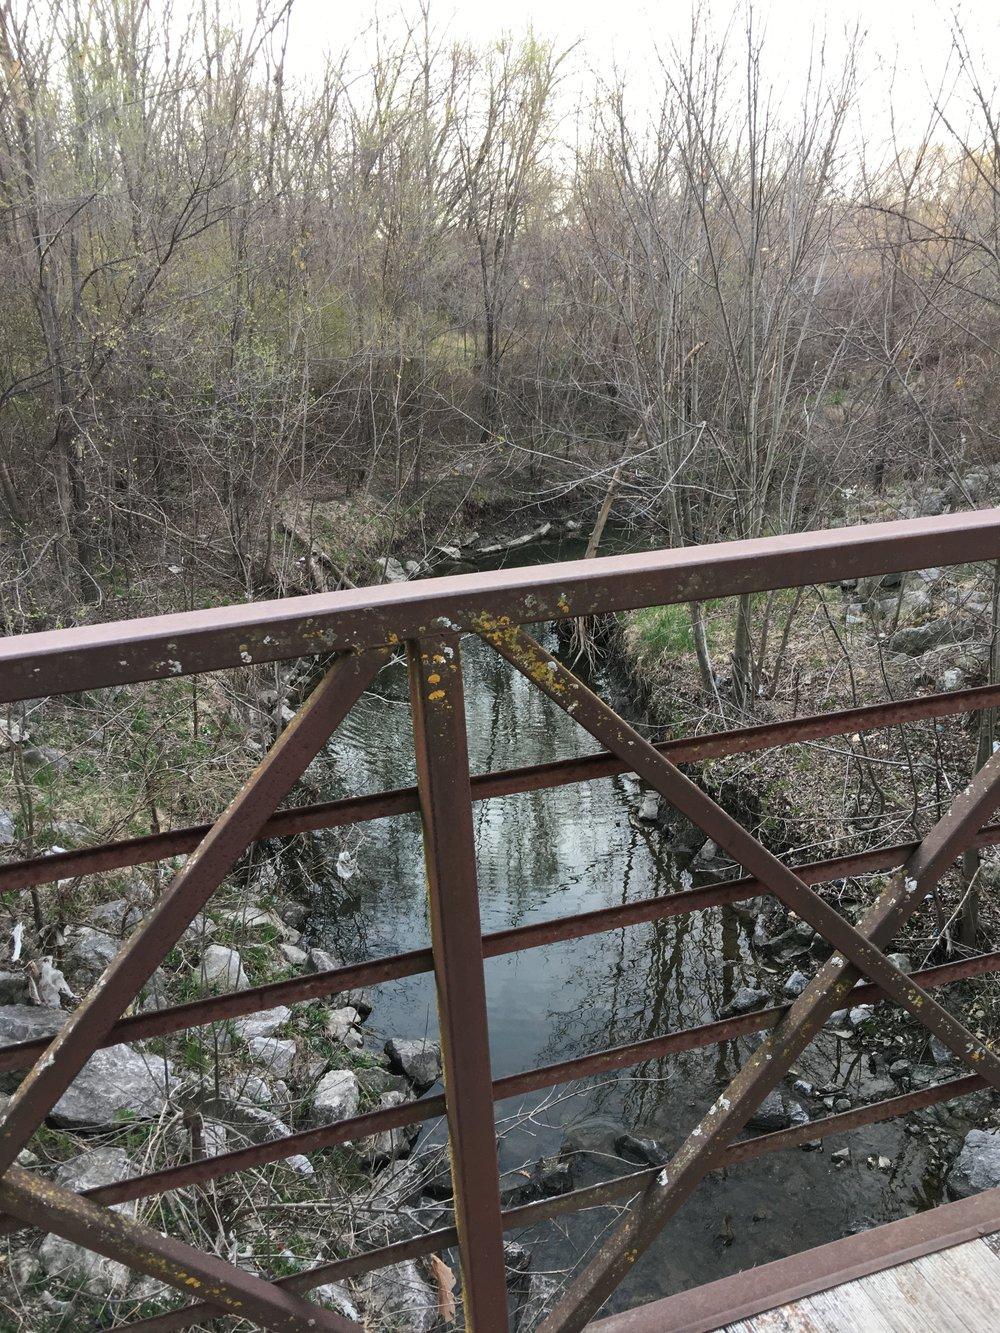 Bridge crossing over the small creek